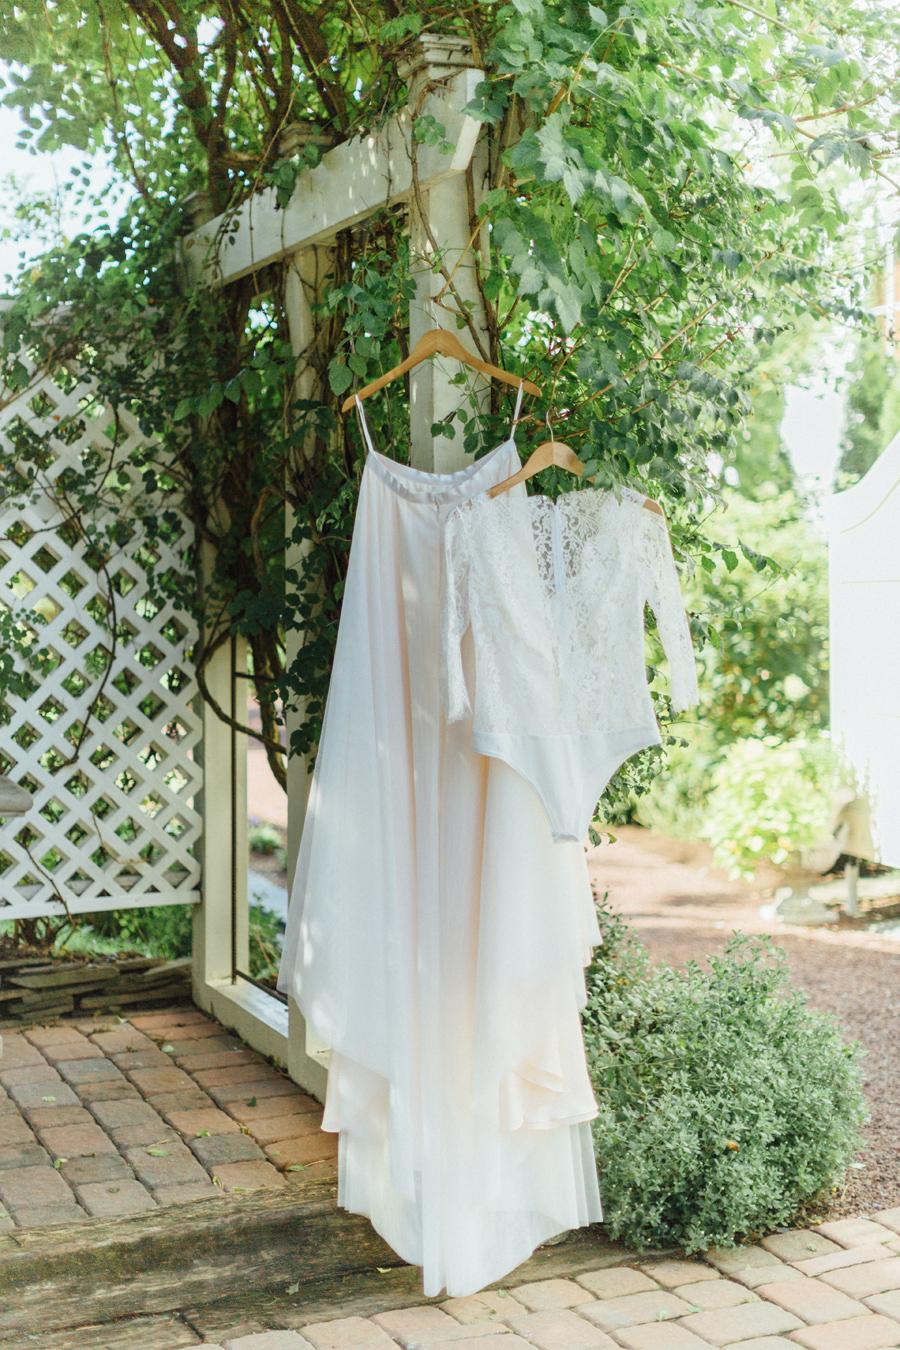 the-inn-at-leola-wedding-lancaster-pennsylvania-wedding-photographer-rebeka-viola-photograhy (1).jpg